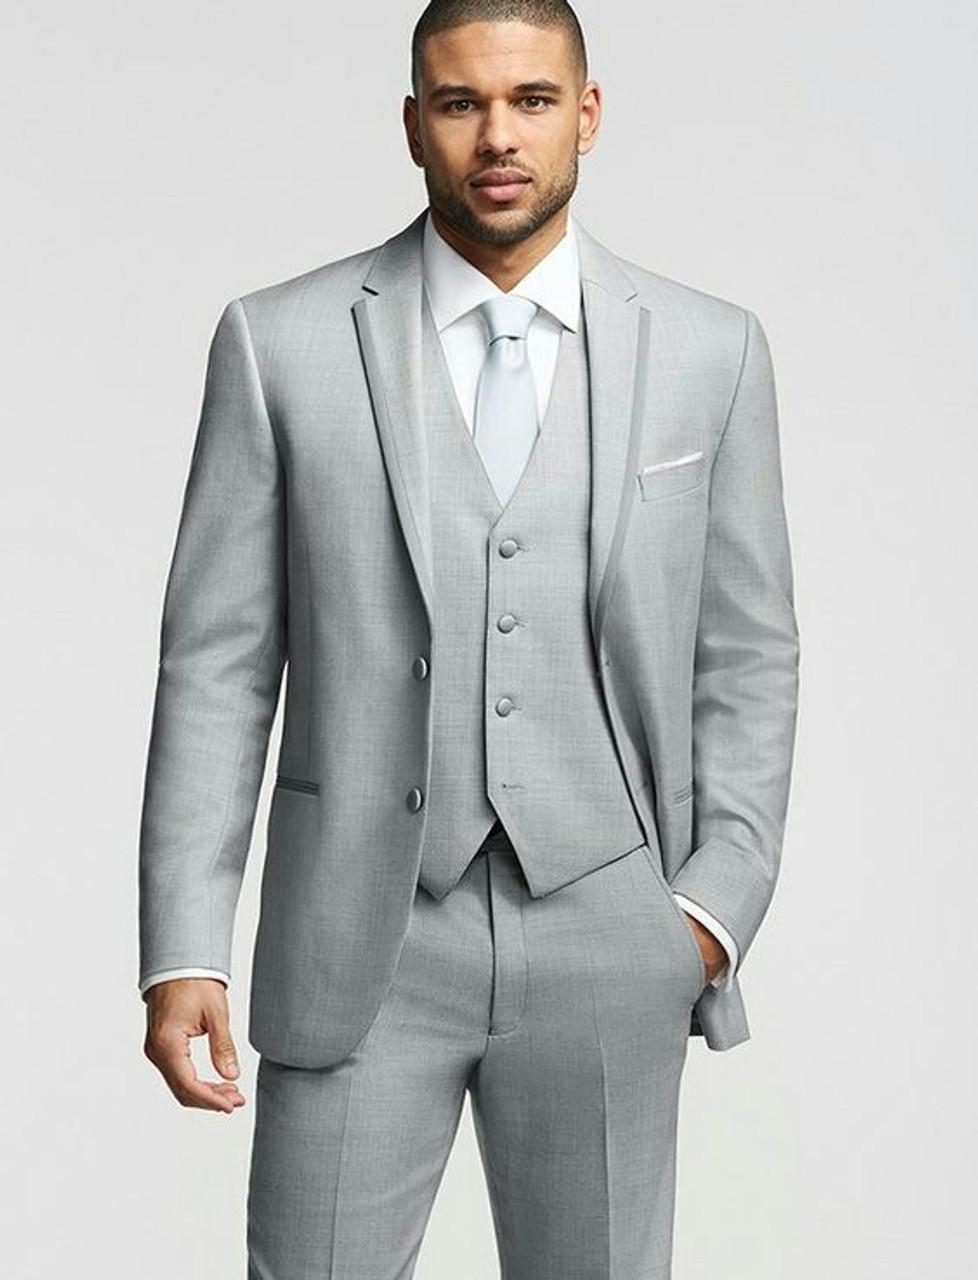 2019 Men Suits for Wedding Grey Men Suit Classic Slim fit Blazer Masculino  Simple Custom Prom Men Tuxedo 3 Piece Vestidos W46